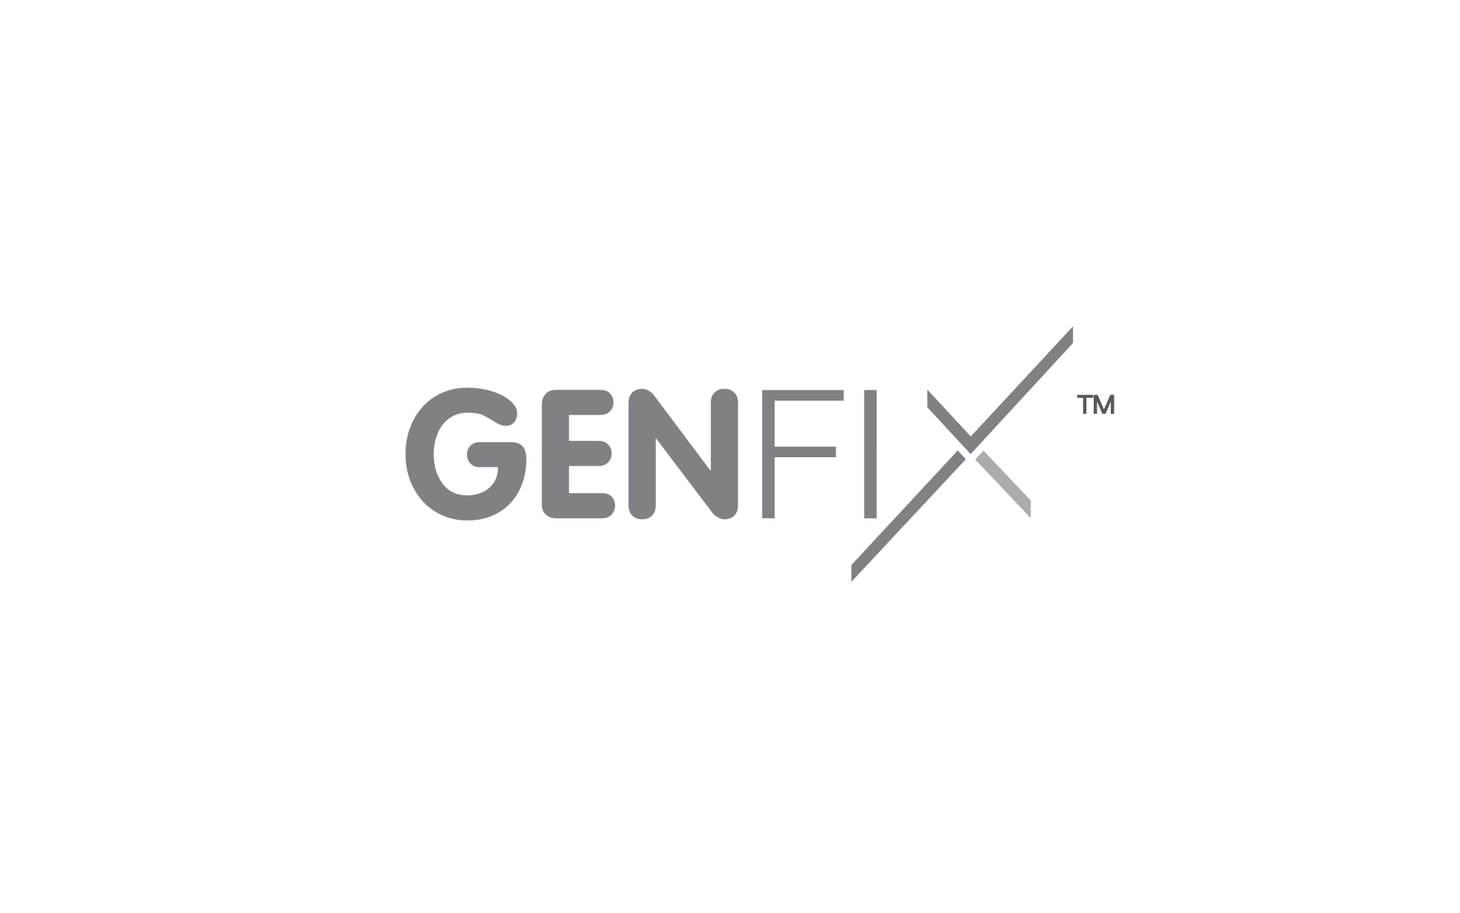 LHF_GENFIX_logo_20150212_2-04-04.jpg